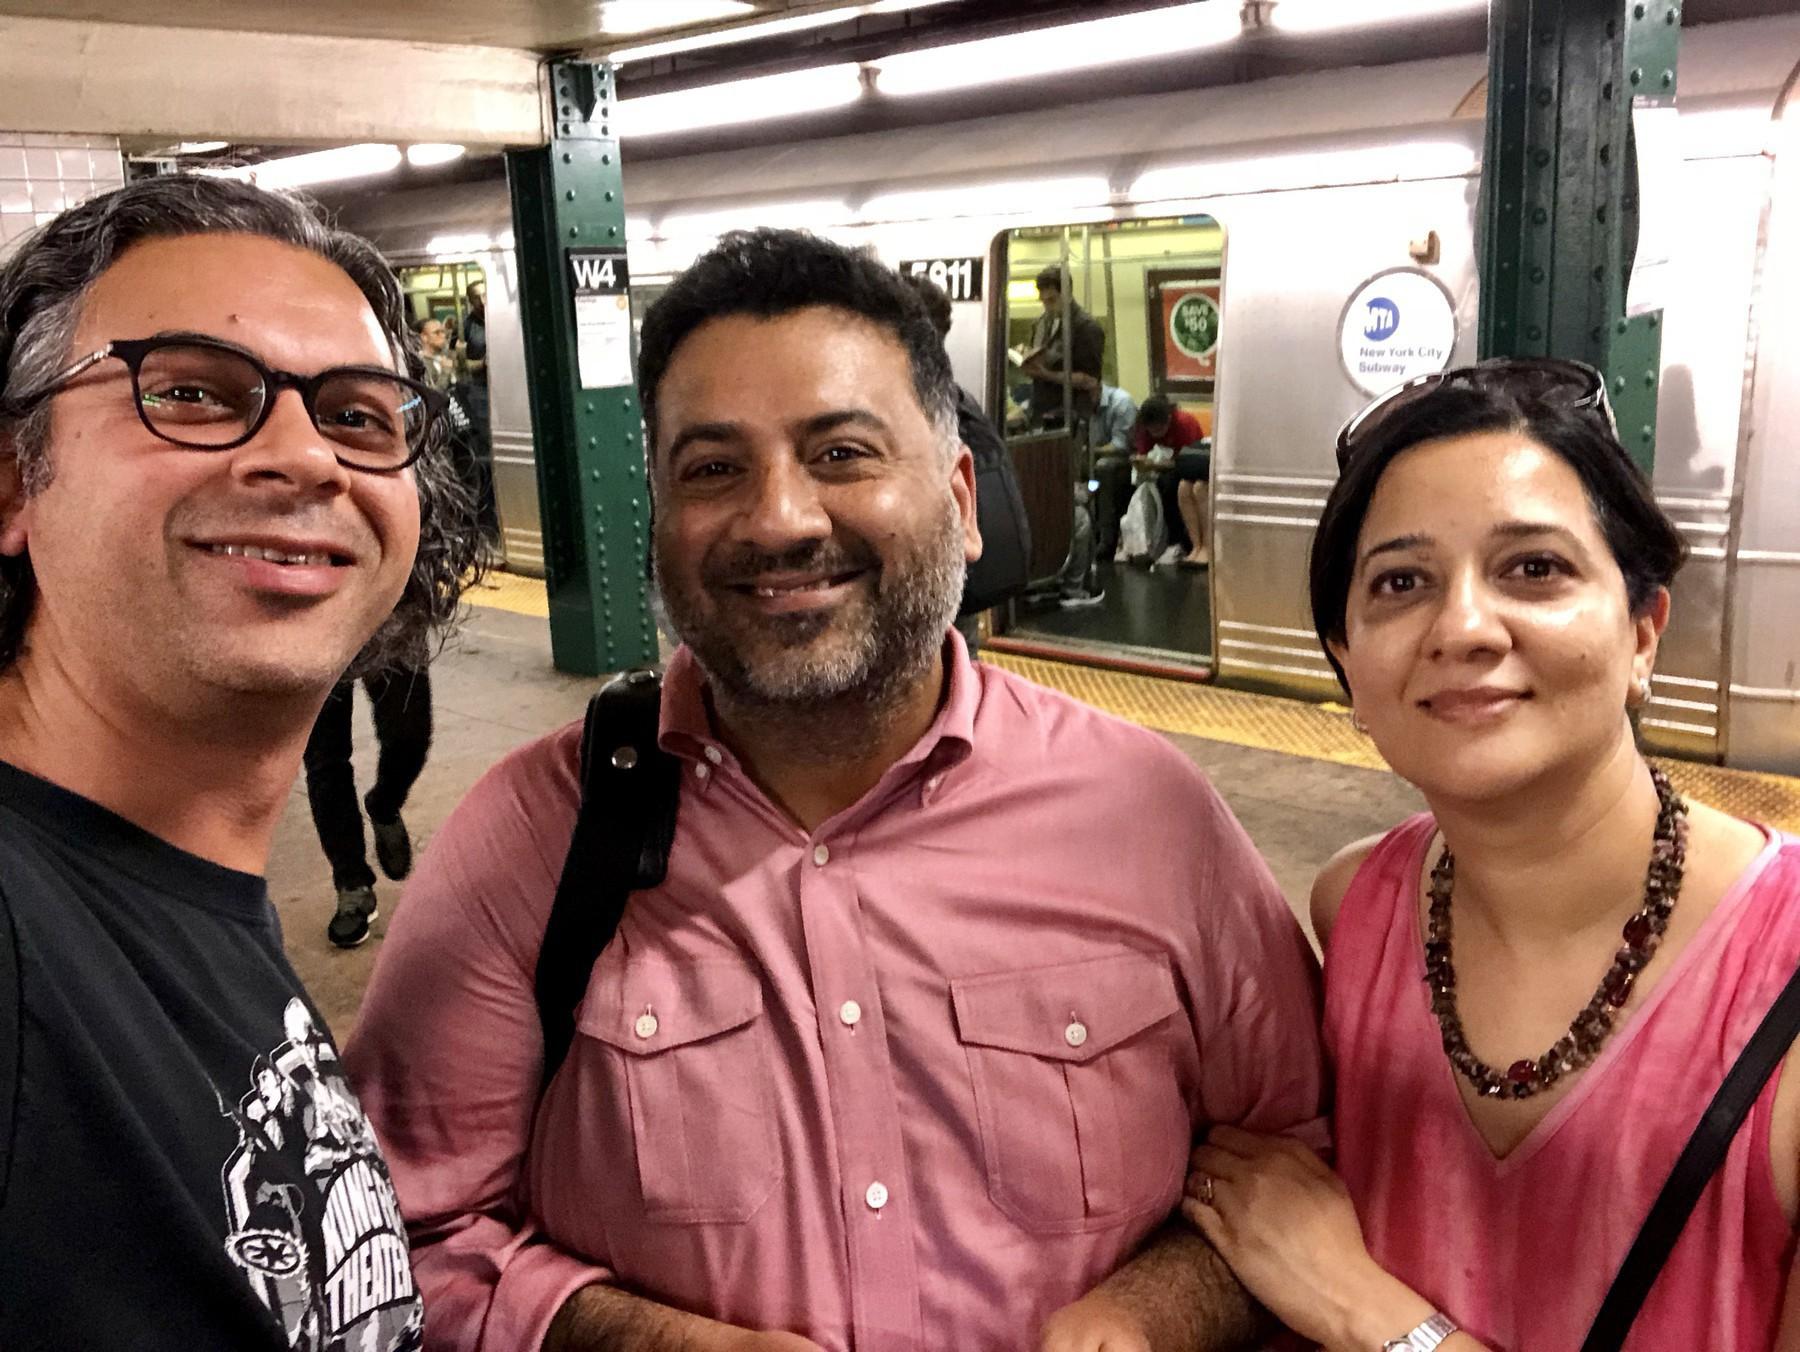 With Ashish and Manisha. New York City. September, 2018.